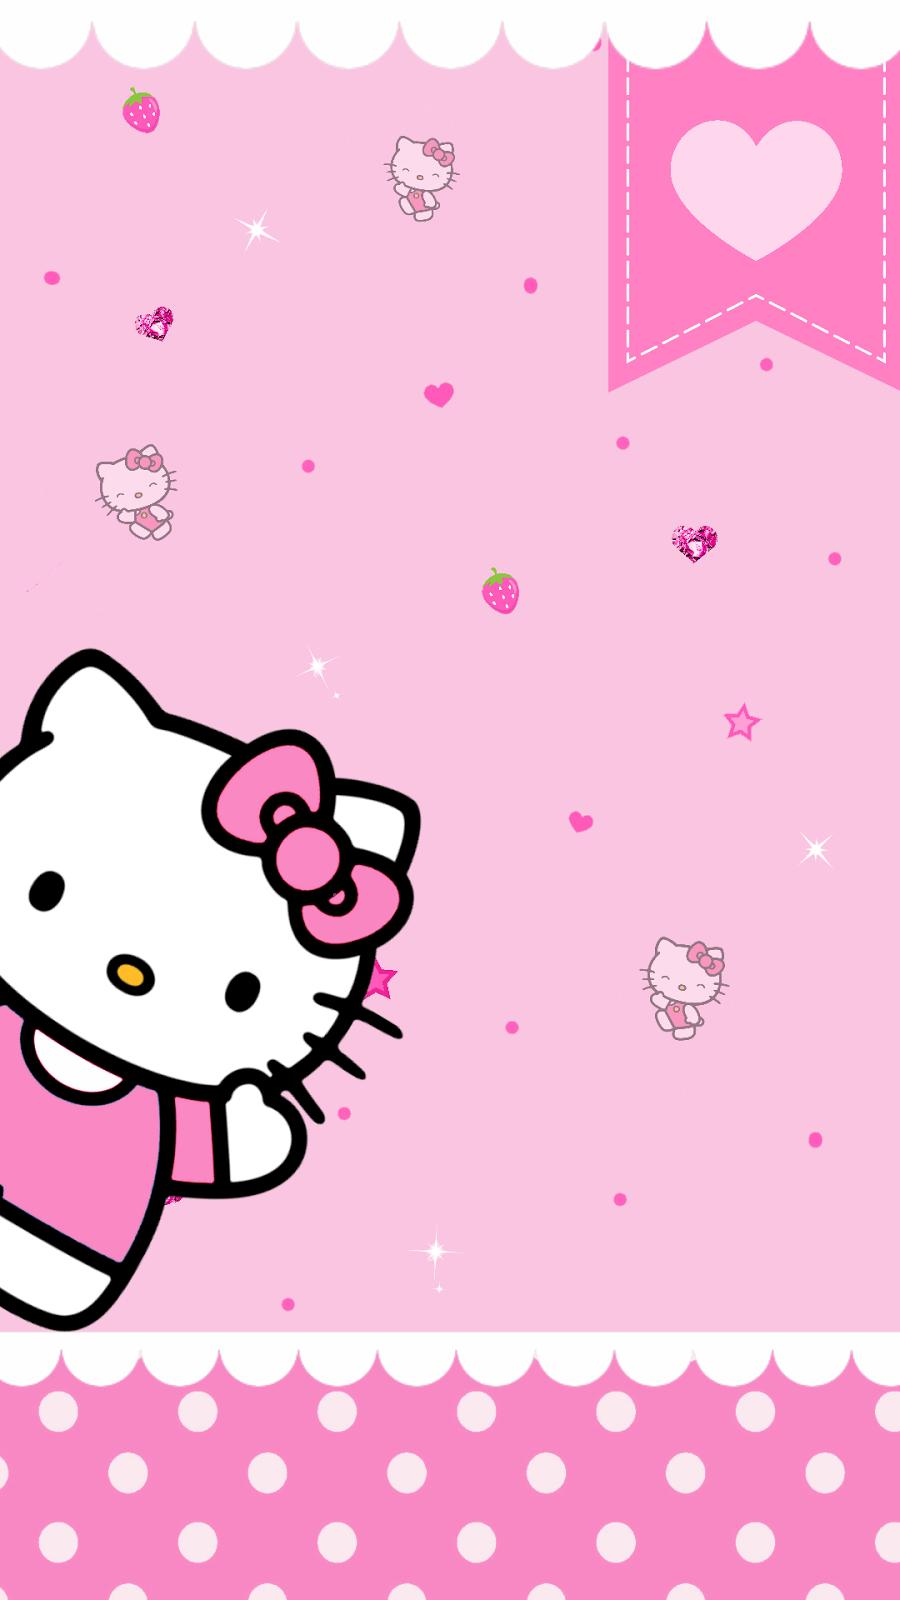 Hello Kitty Wallpaper Hd Portrait Doraemon In 2020 Hello Kitty Backgrounds Hello Kitty Wallpaper Hd Hello Kitty Pictures